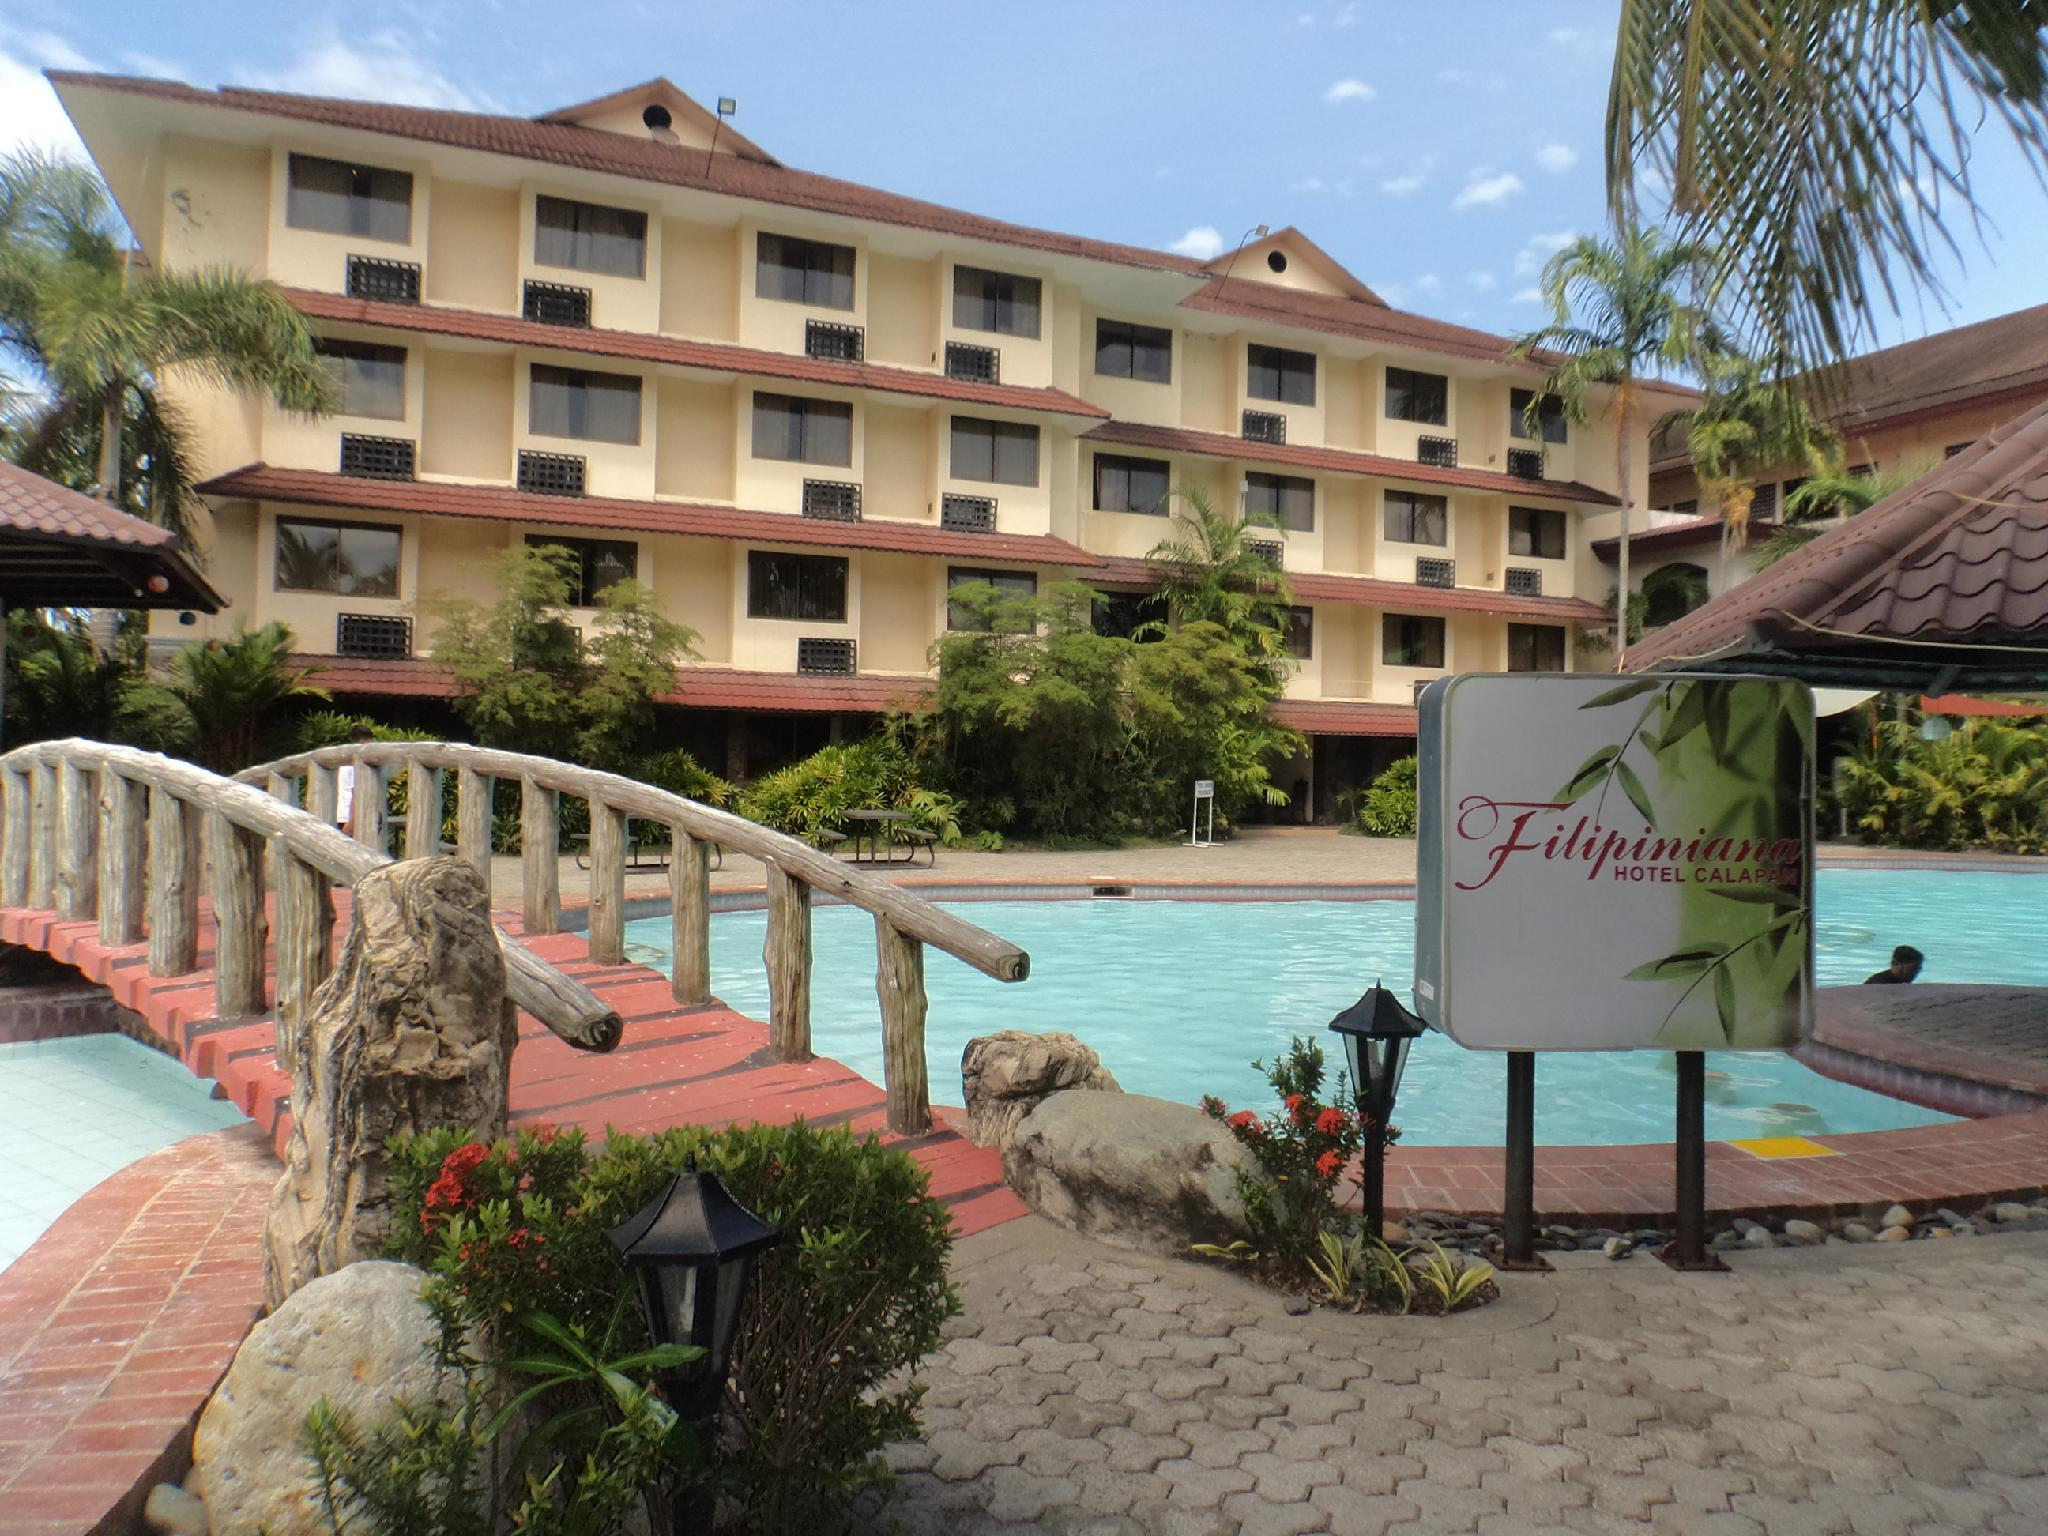 Filipiniana Hotel Calapan Calapan Philippines